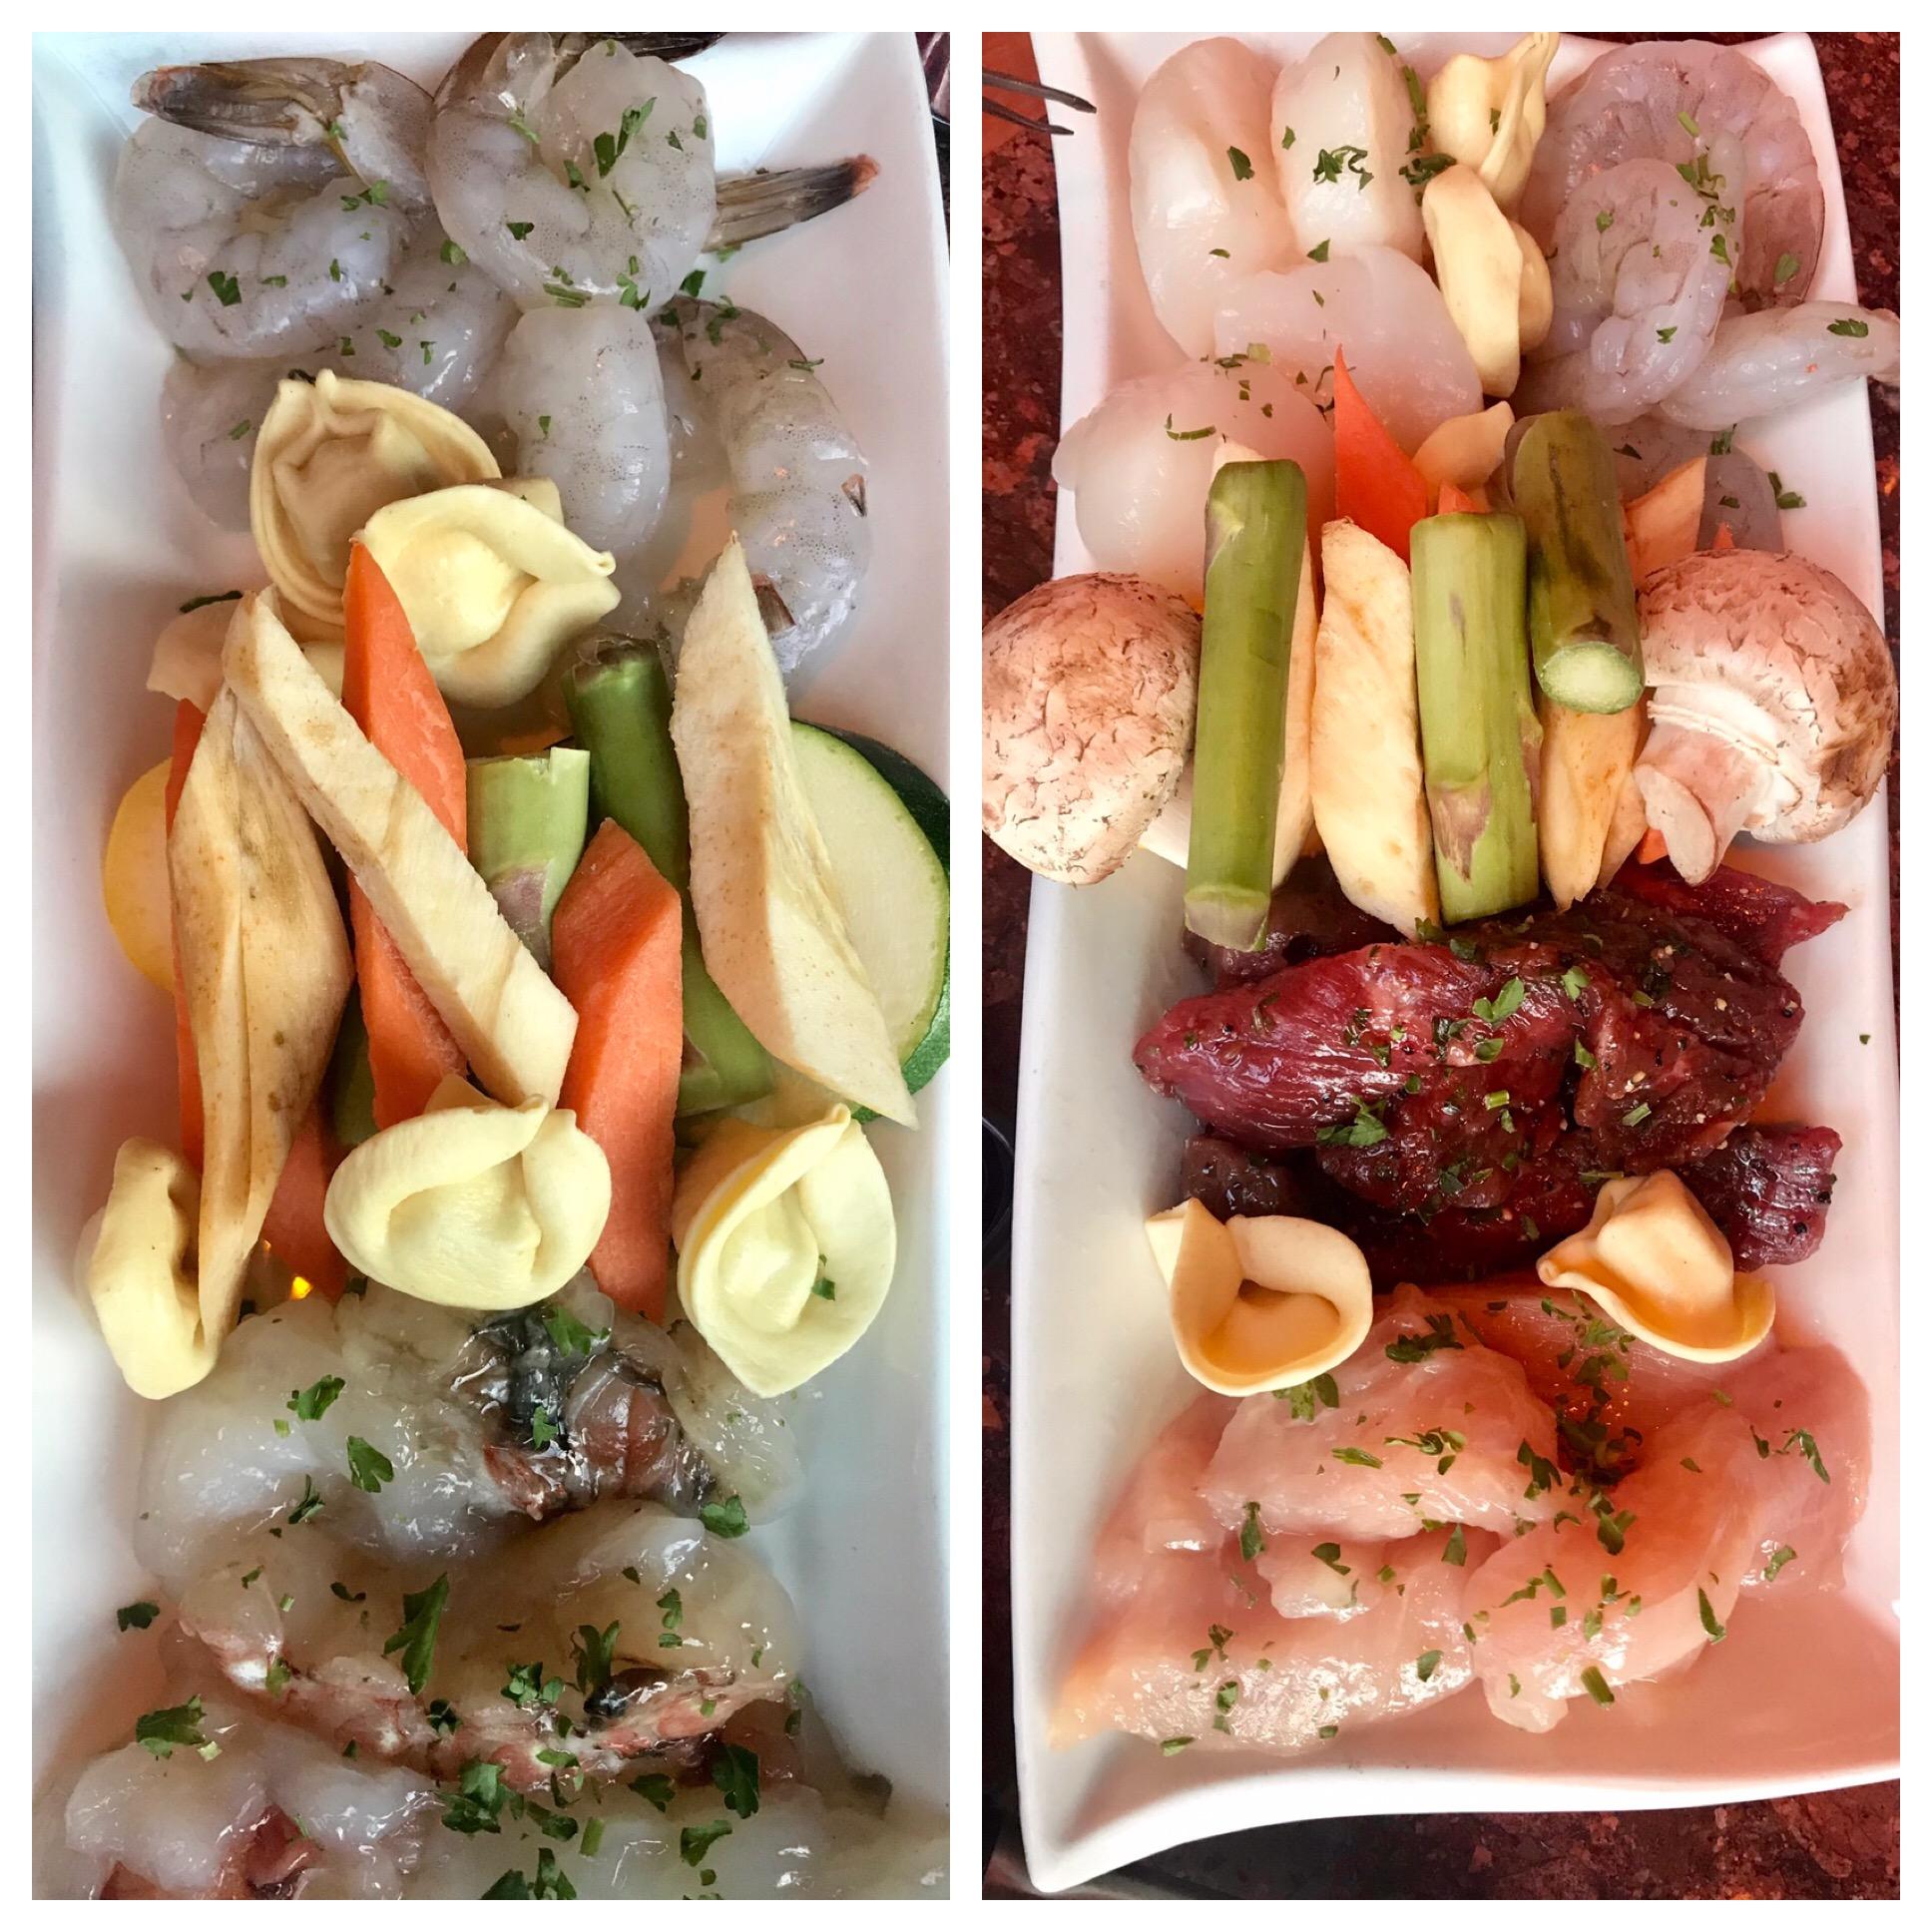 Raw meat/fish/vegetable platters in Urban Fondue in Portland, OR